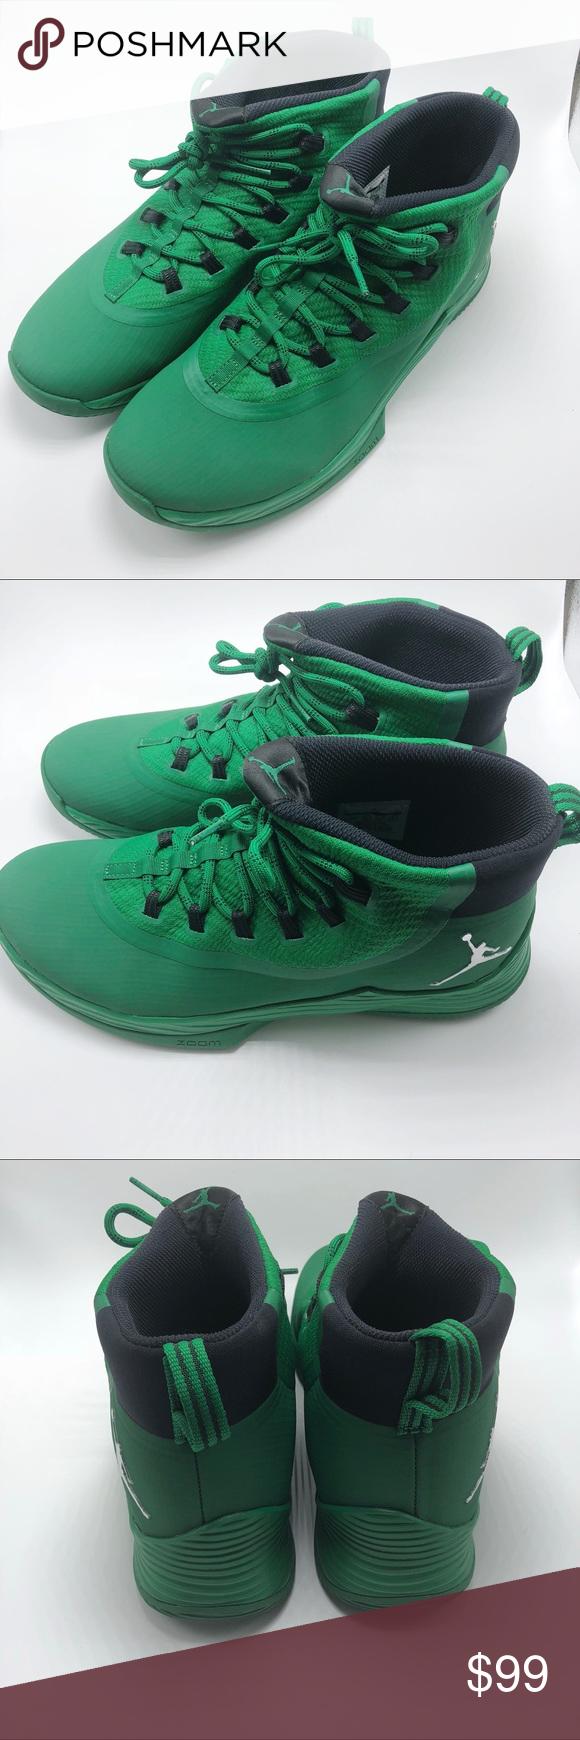 1caf72d61f7e86 Jordan Ultra Fly 2 Zoom TB Celtics Green (SH20) Nike 921211-301 Mens Jordan  Ultra Fly 2 Zoom TB Celtics Green Size 11.5 (SH20) Jordan Shoes Sneakers